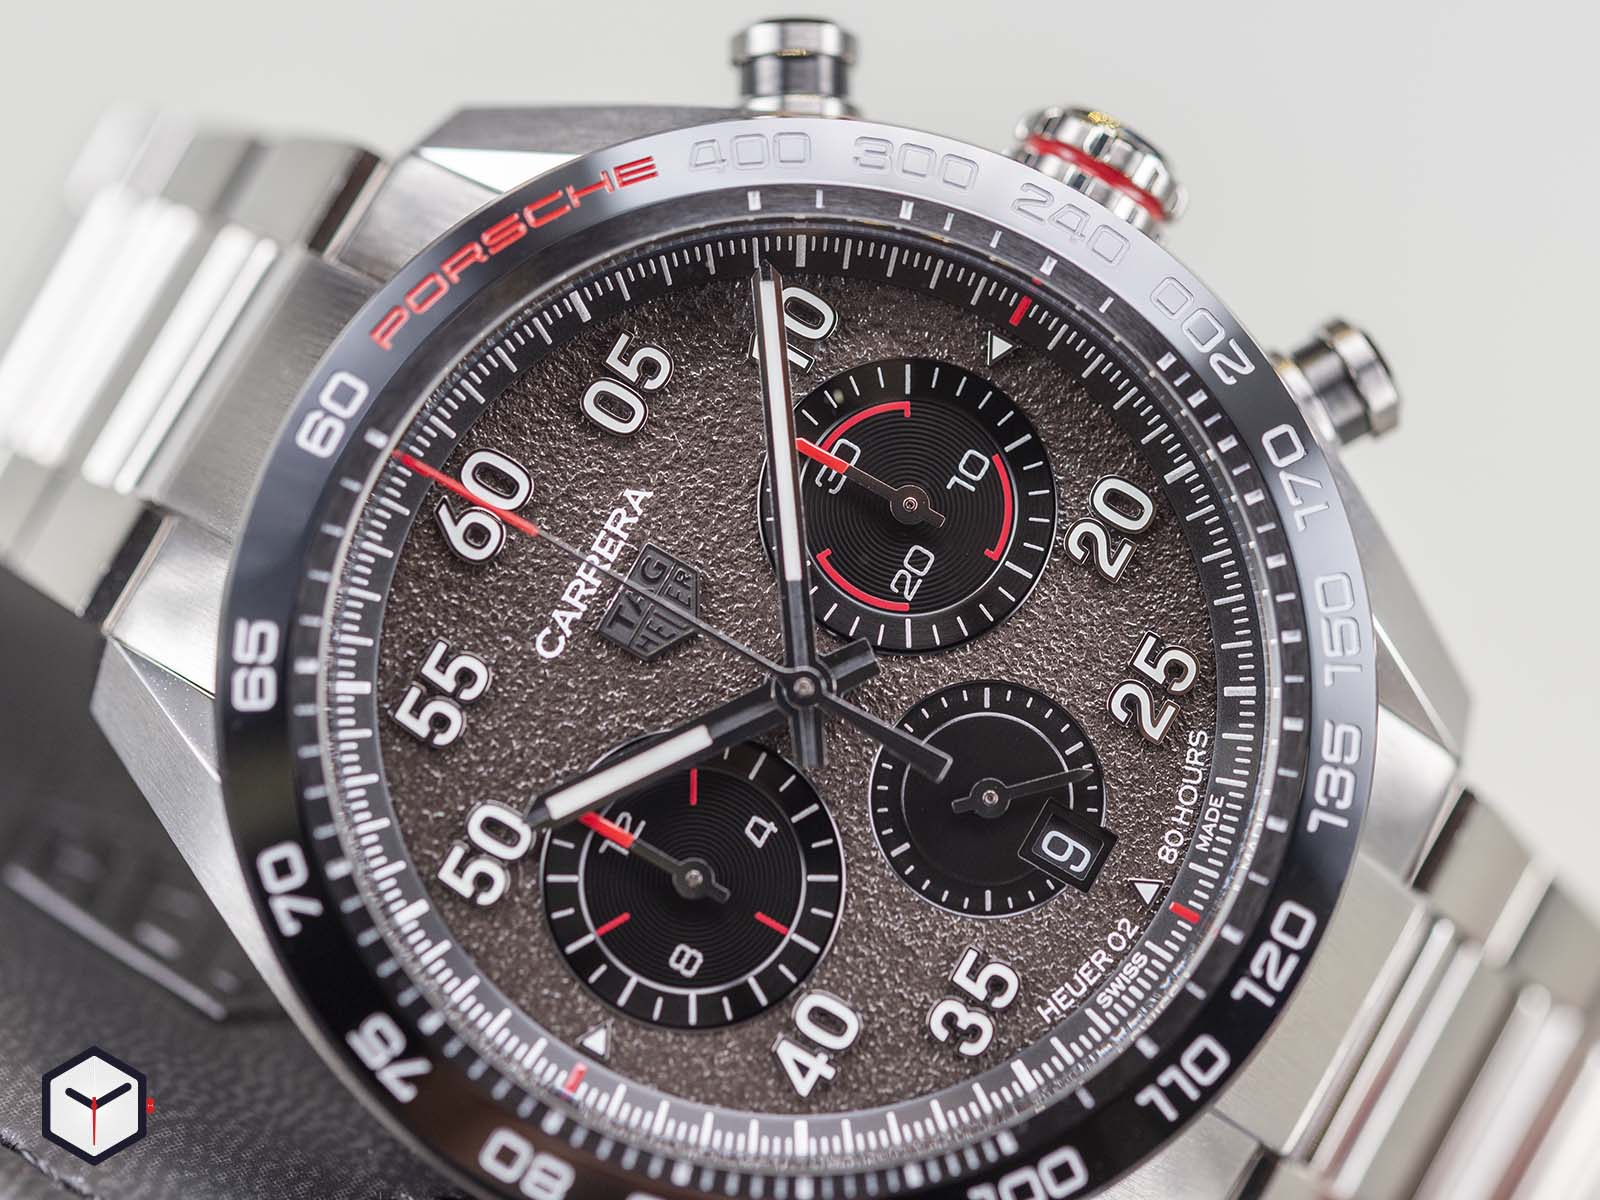 cbn2a1f-ba0643-tag-heuer-carrera-porsche-chronograph-1-2.jpg